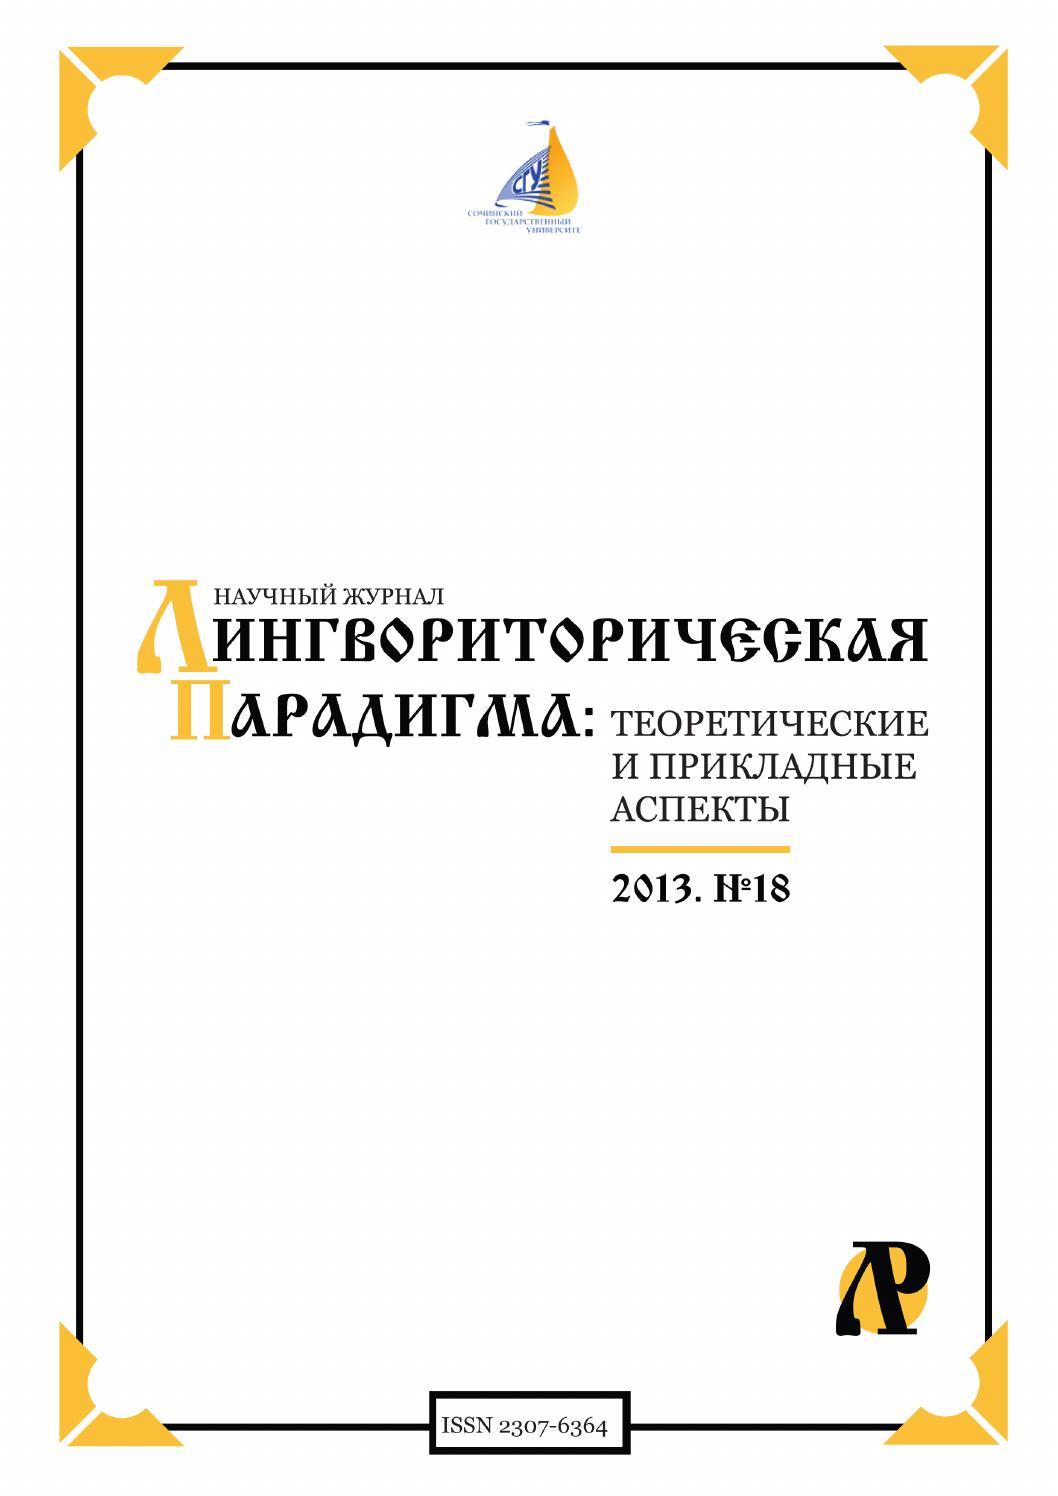 халяпина лариса юрьевна прокуратура саратов фото